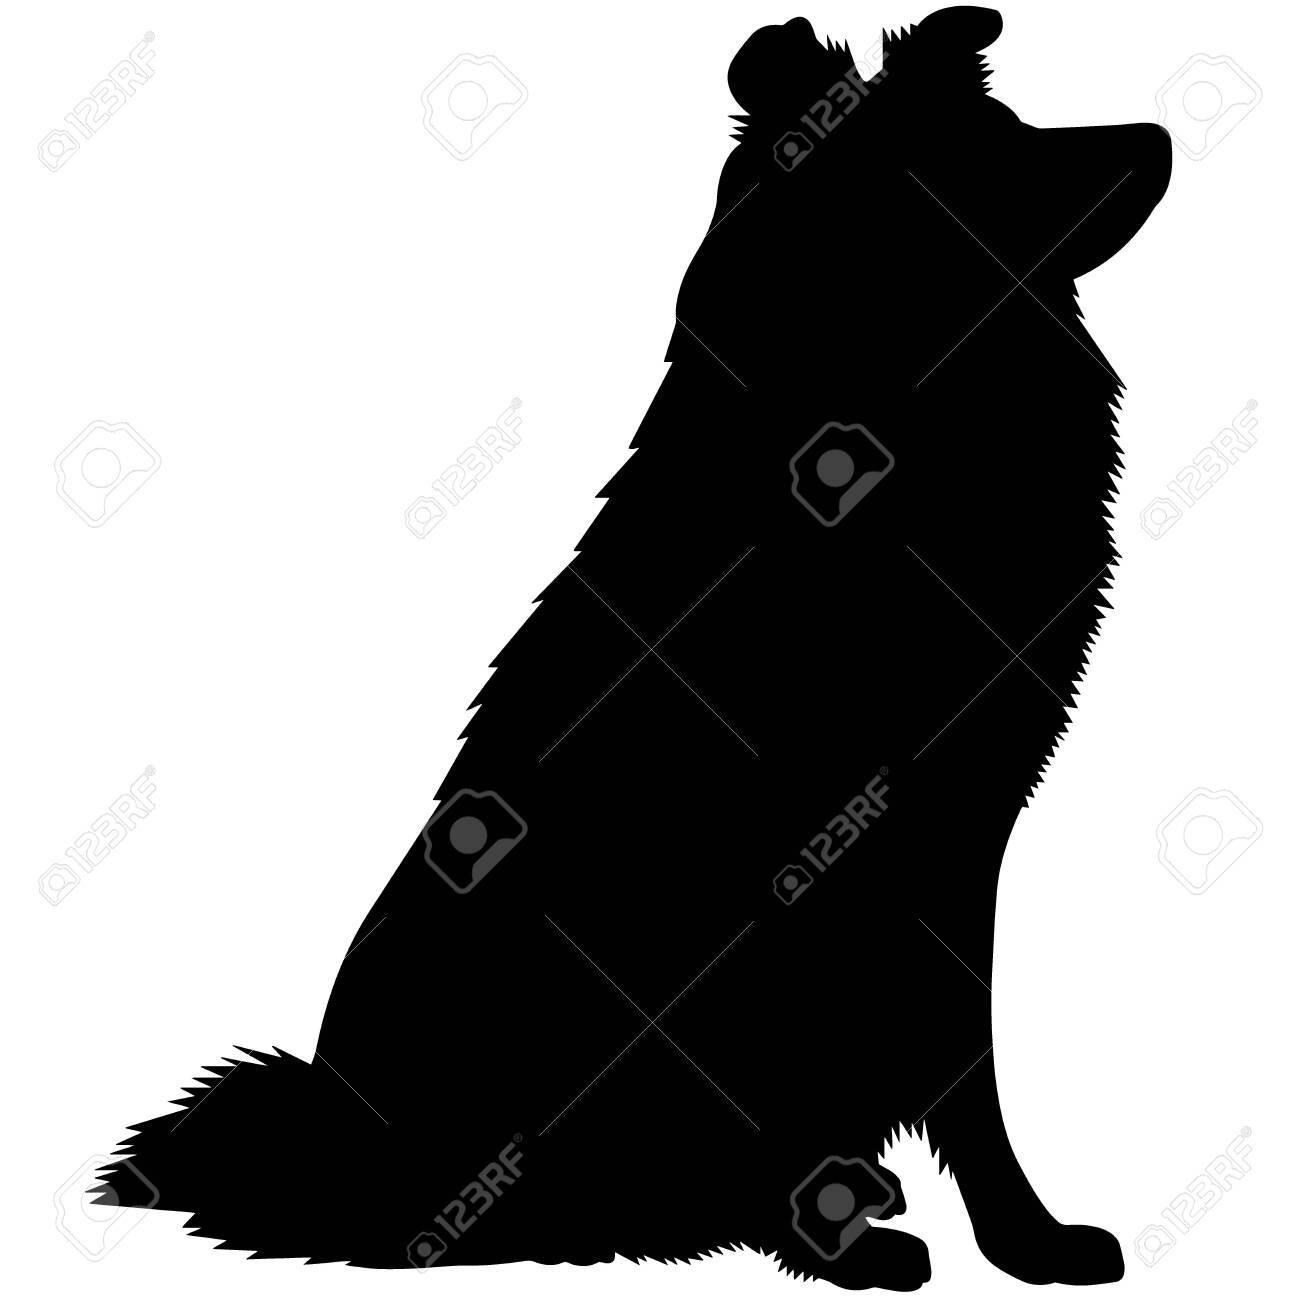 Shetland Sheepdog Dog Silhouette Vector Graphics - 157969672